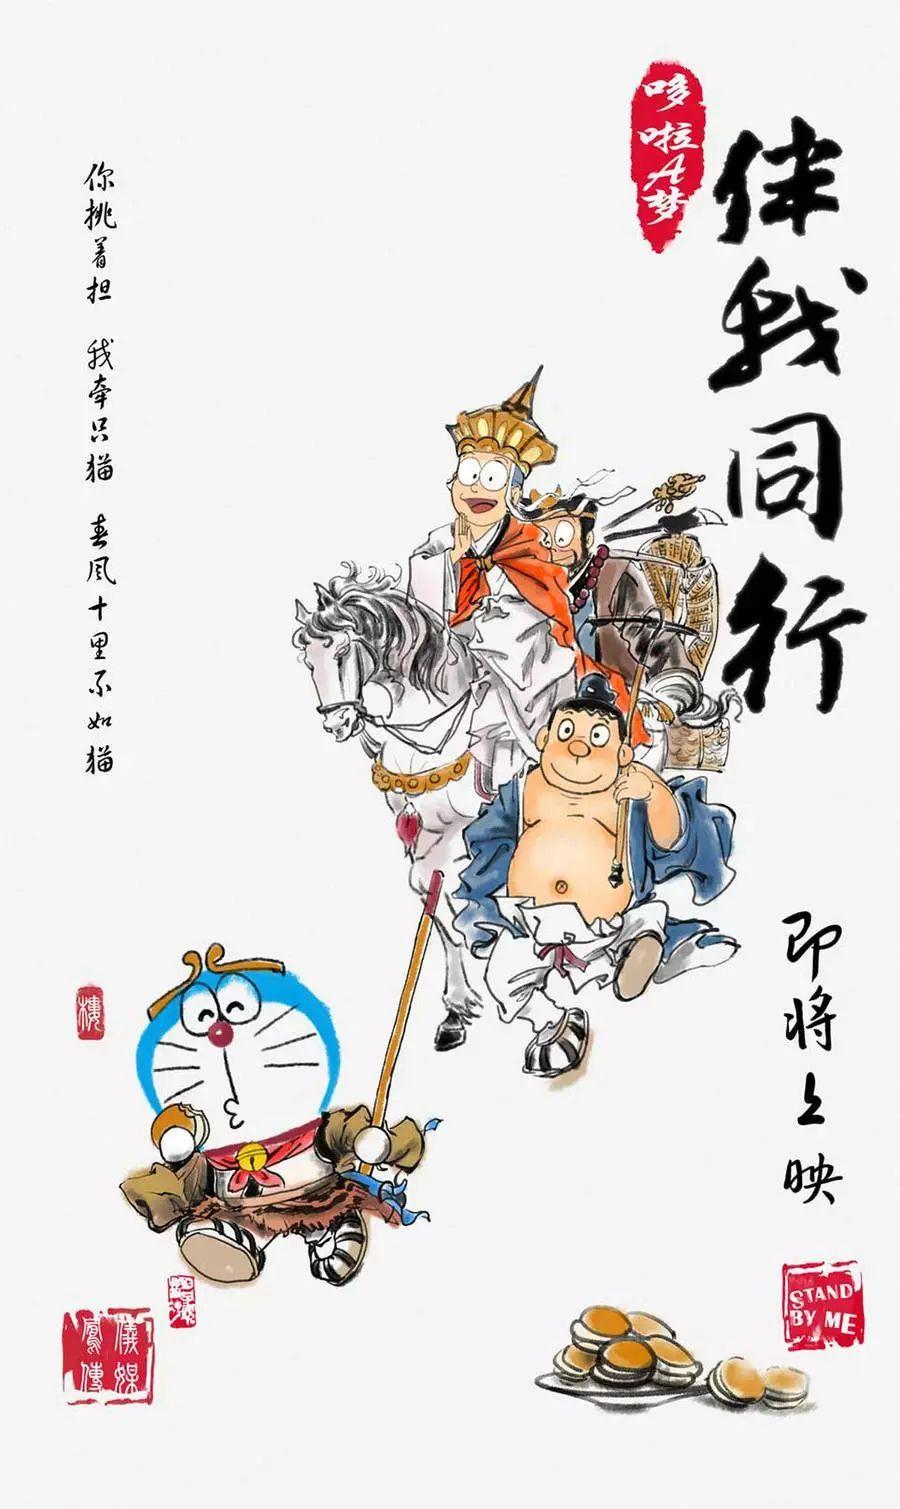 BBC中国风插画海报美哭了 这些好莱坞大片海报,还有更高级的中国风脑洞,总有一张惊艳你